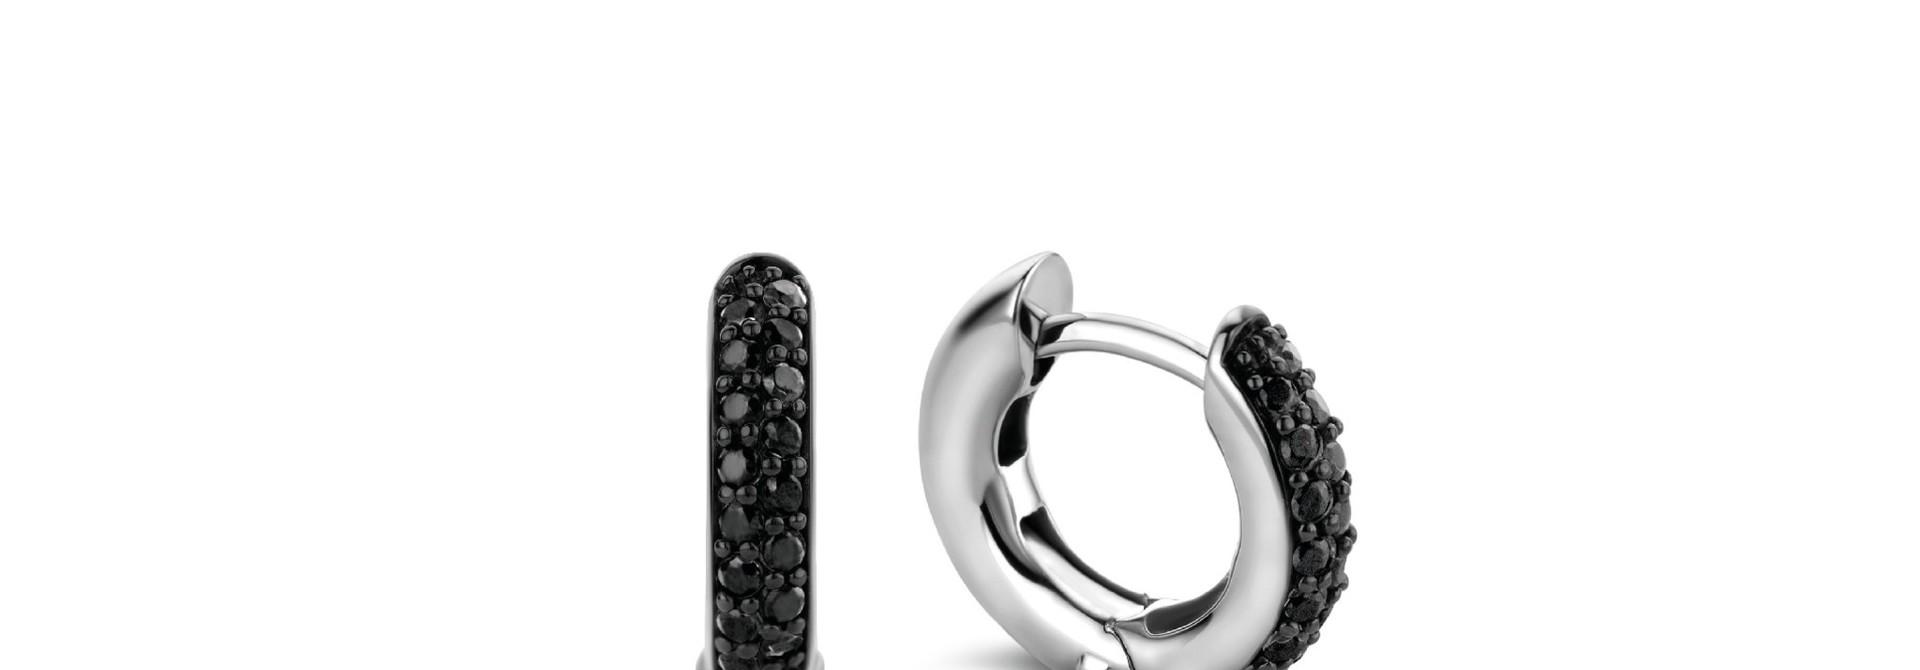 TI SENTO - Milano Earrings 7210ZB